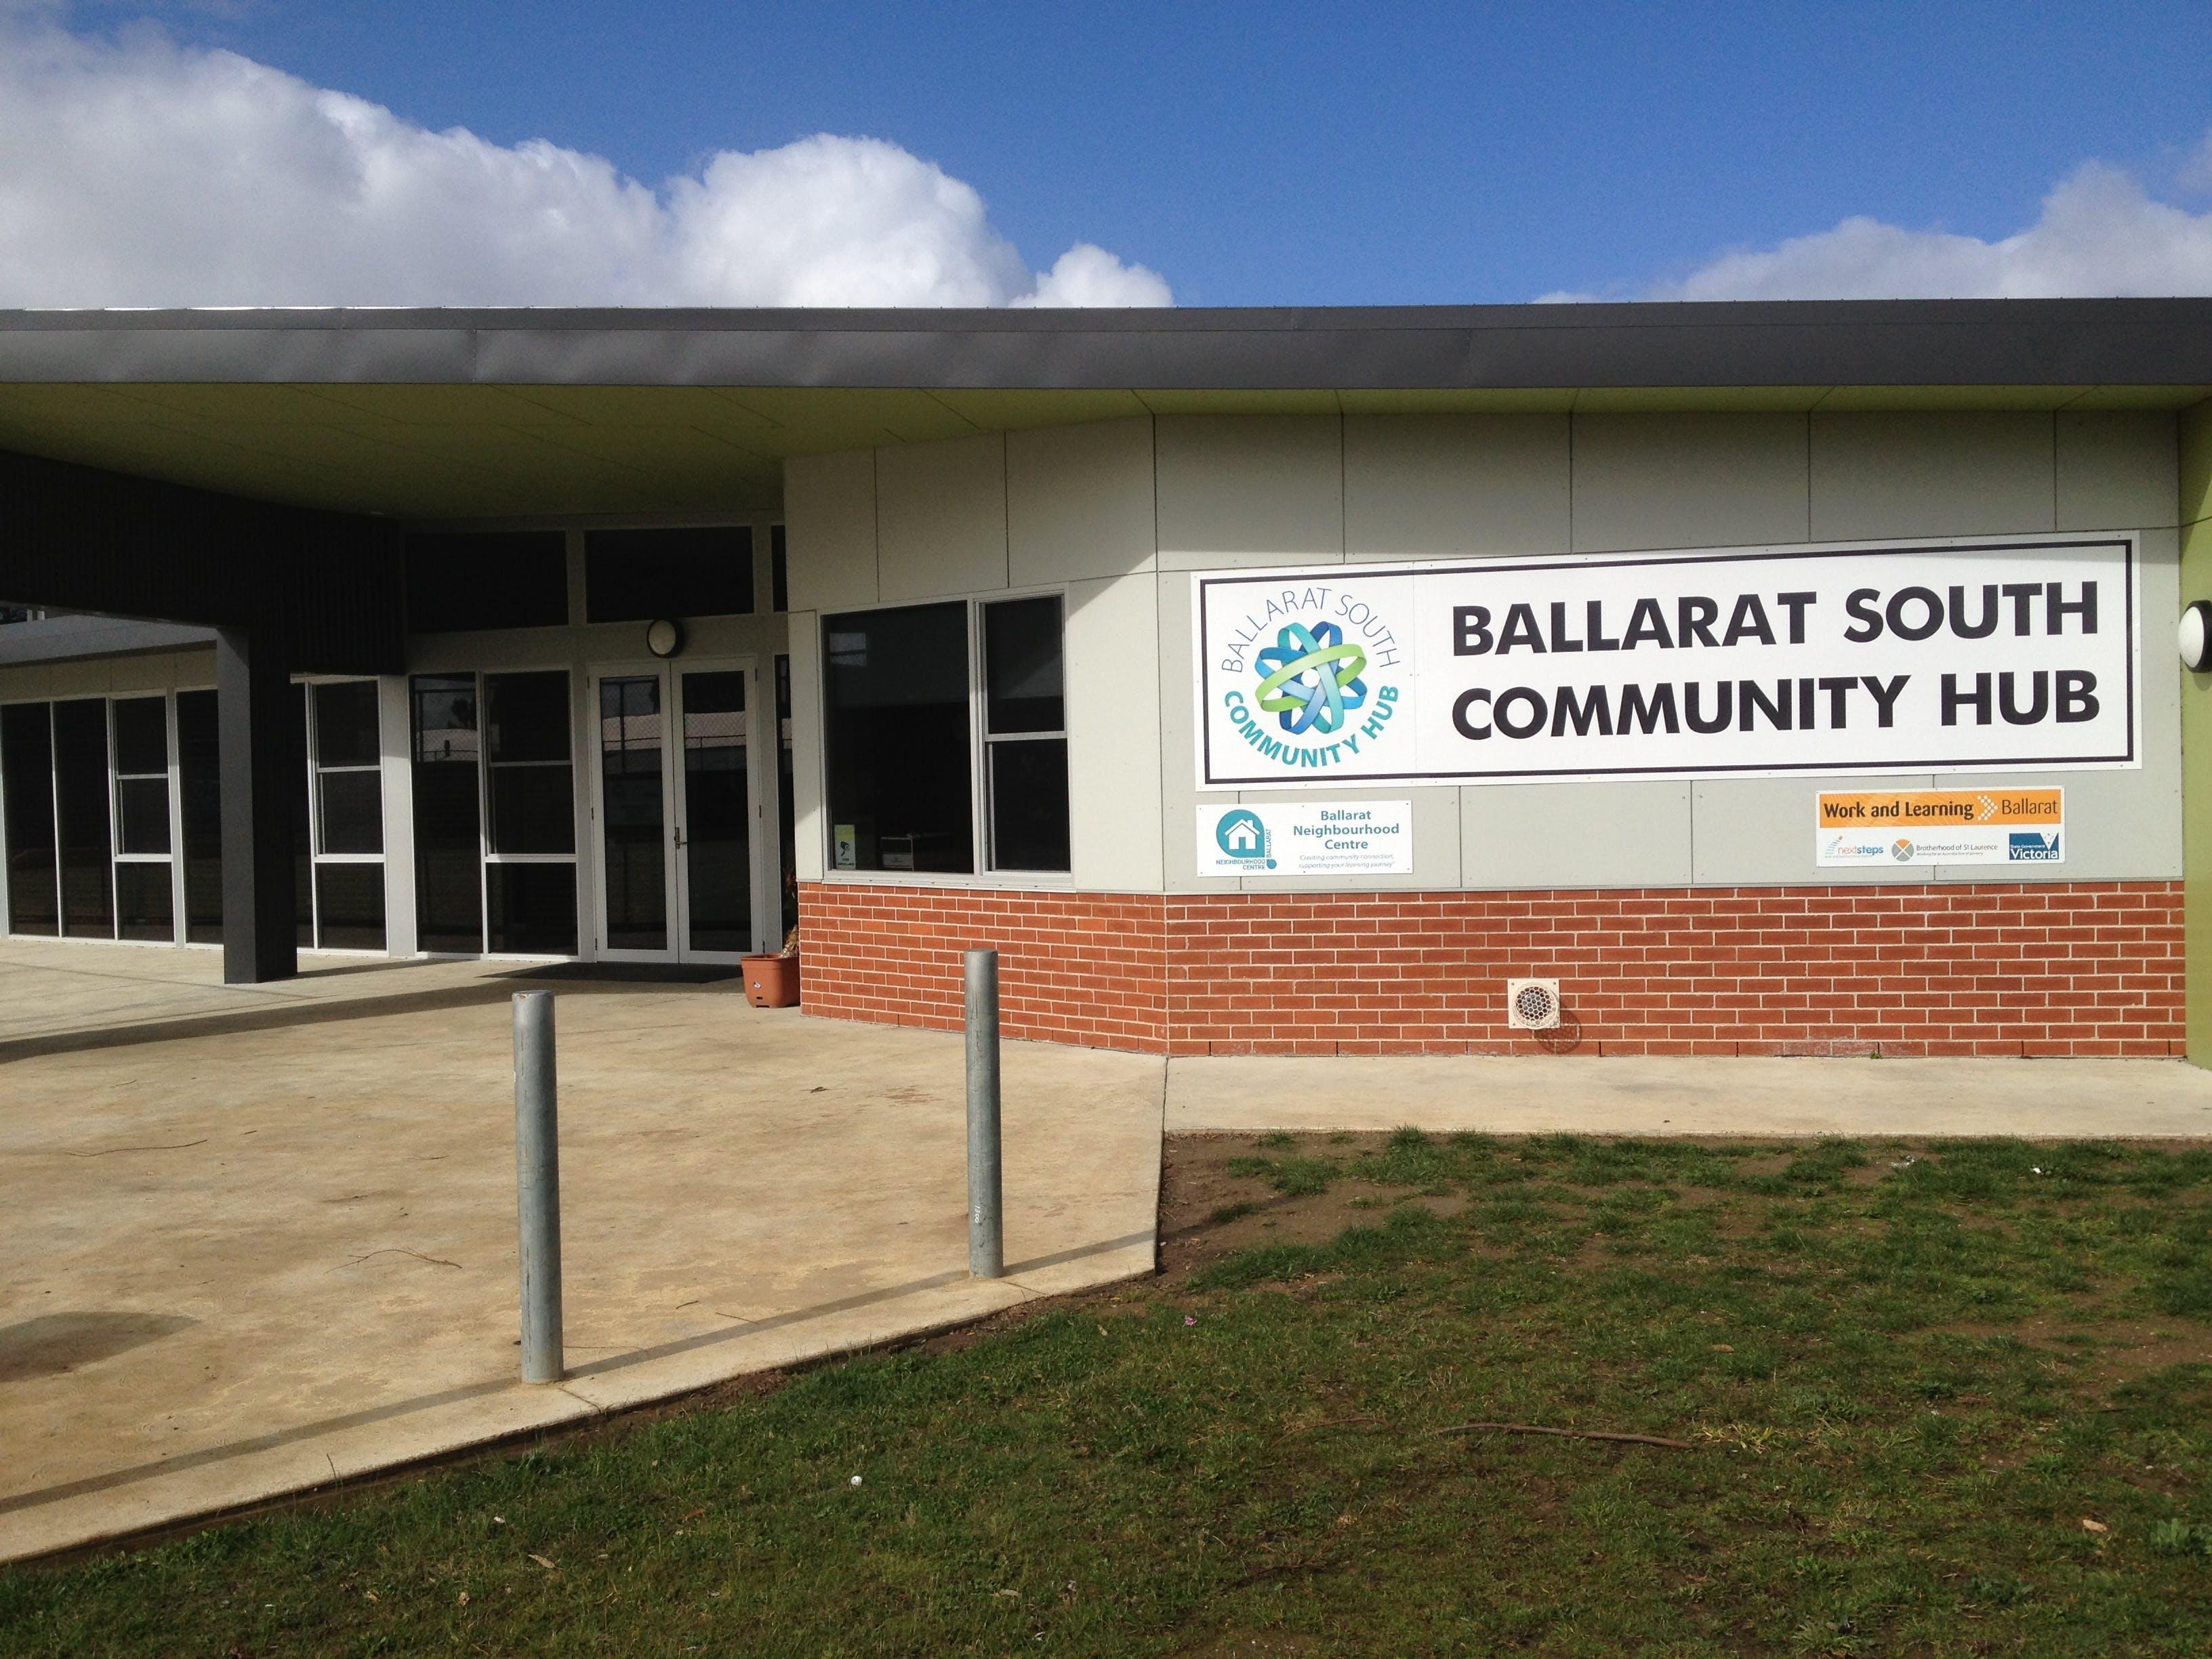 Conference Room, function room at Ballarat South Community Hub, image 1